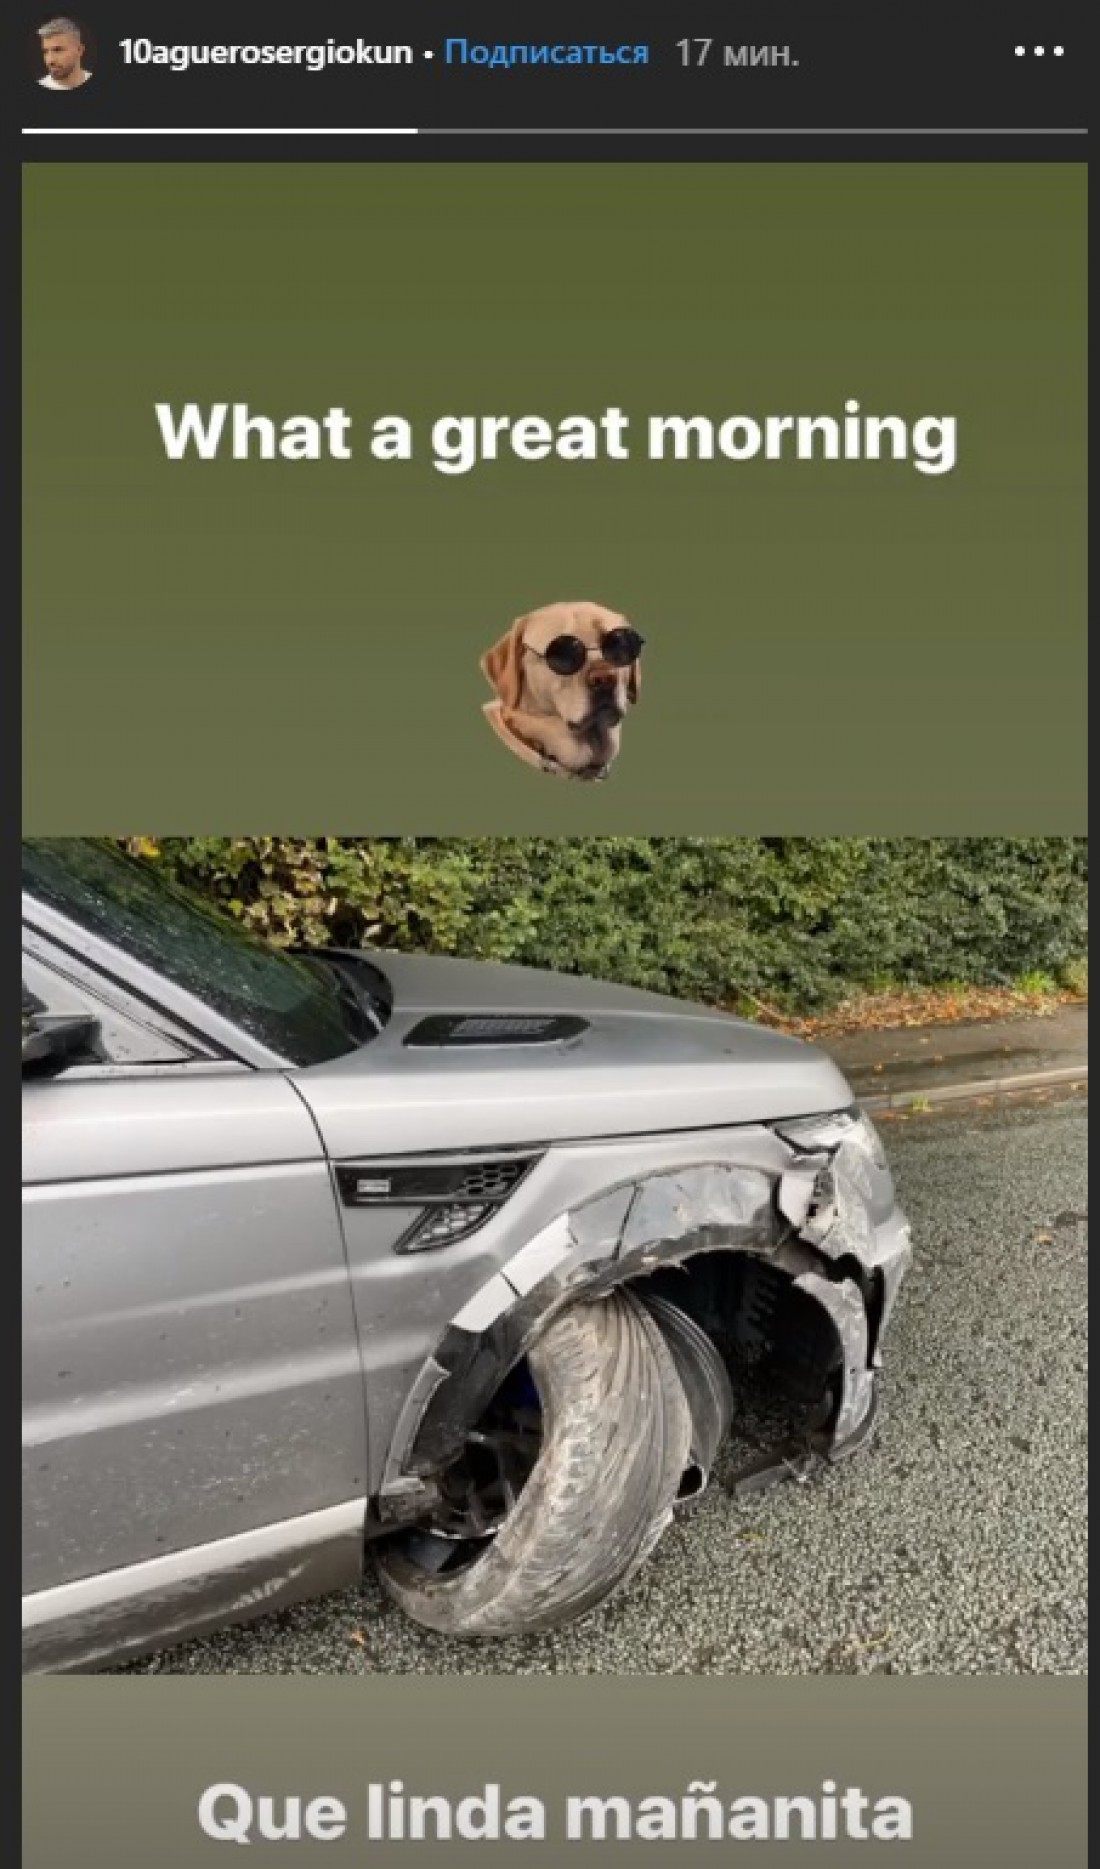 Серхио Агуэро попал в ДТП на своем Range Rover